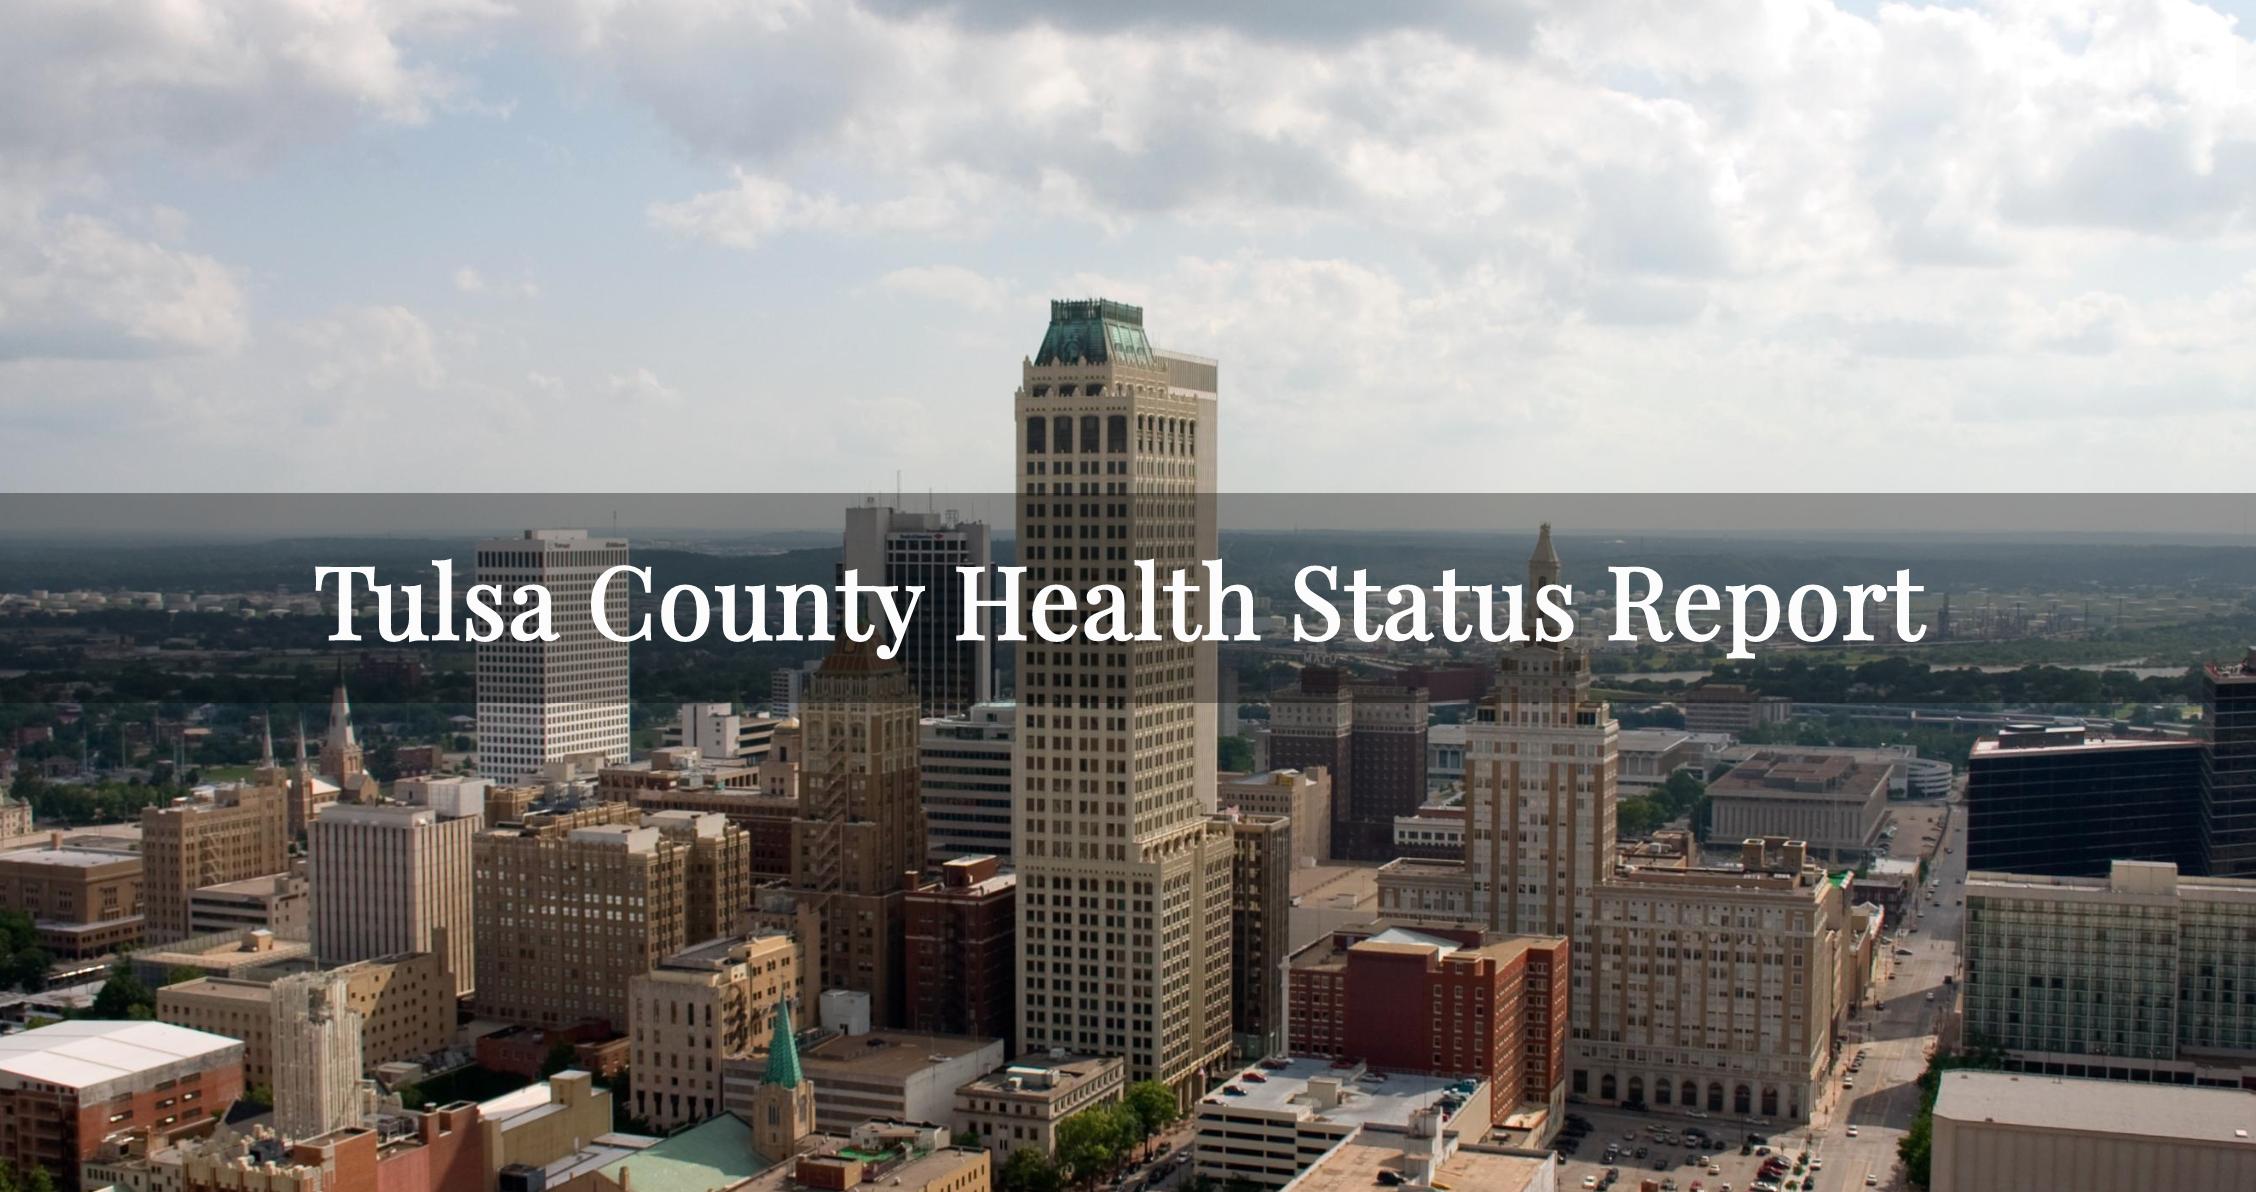 Tulsa County Health Status Report